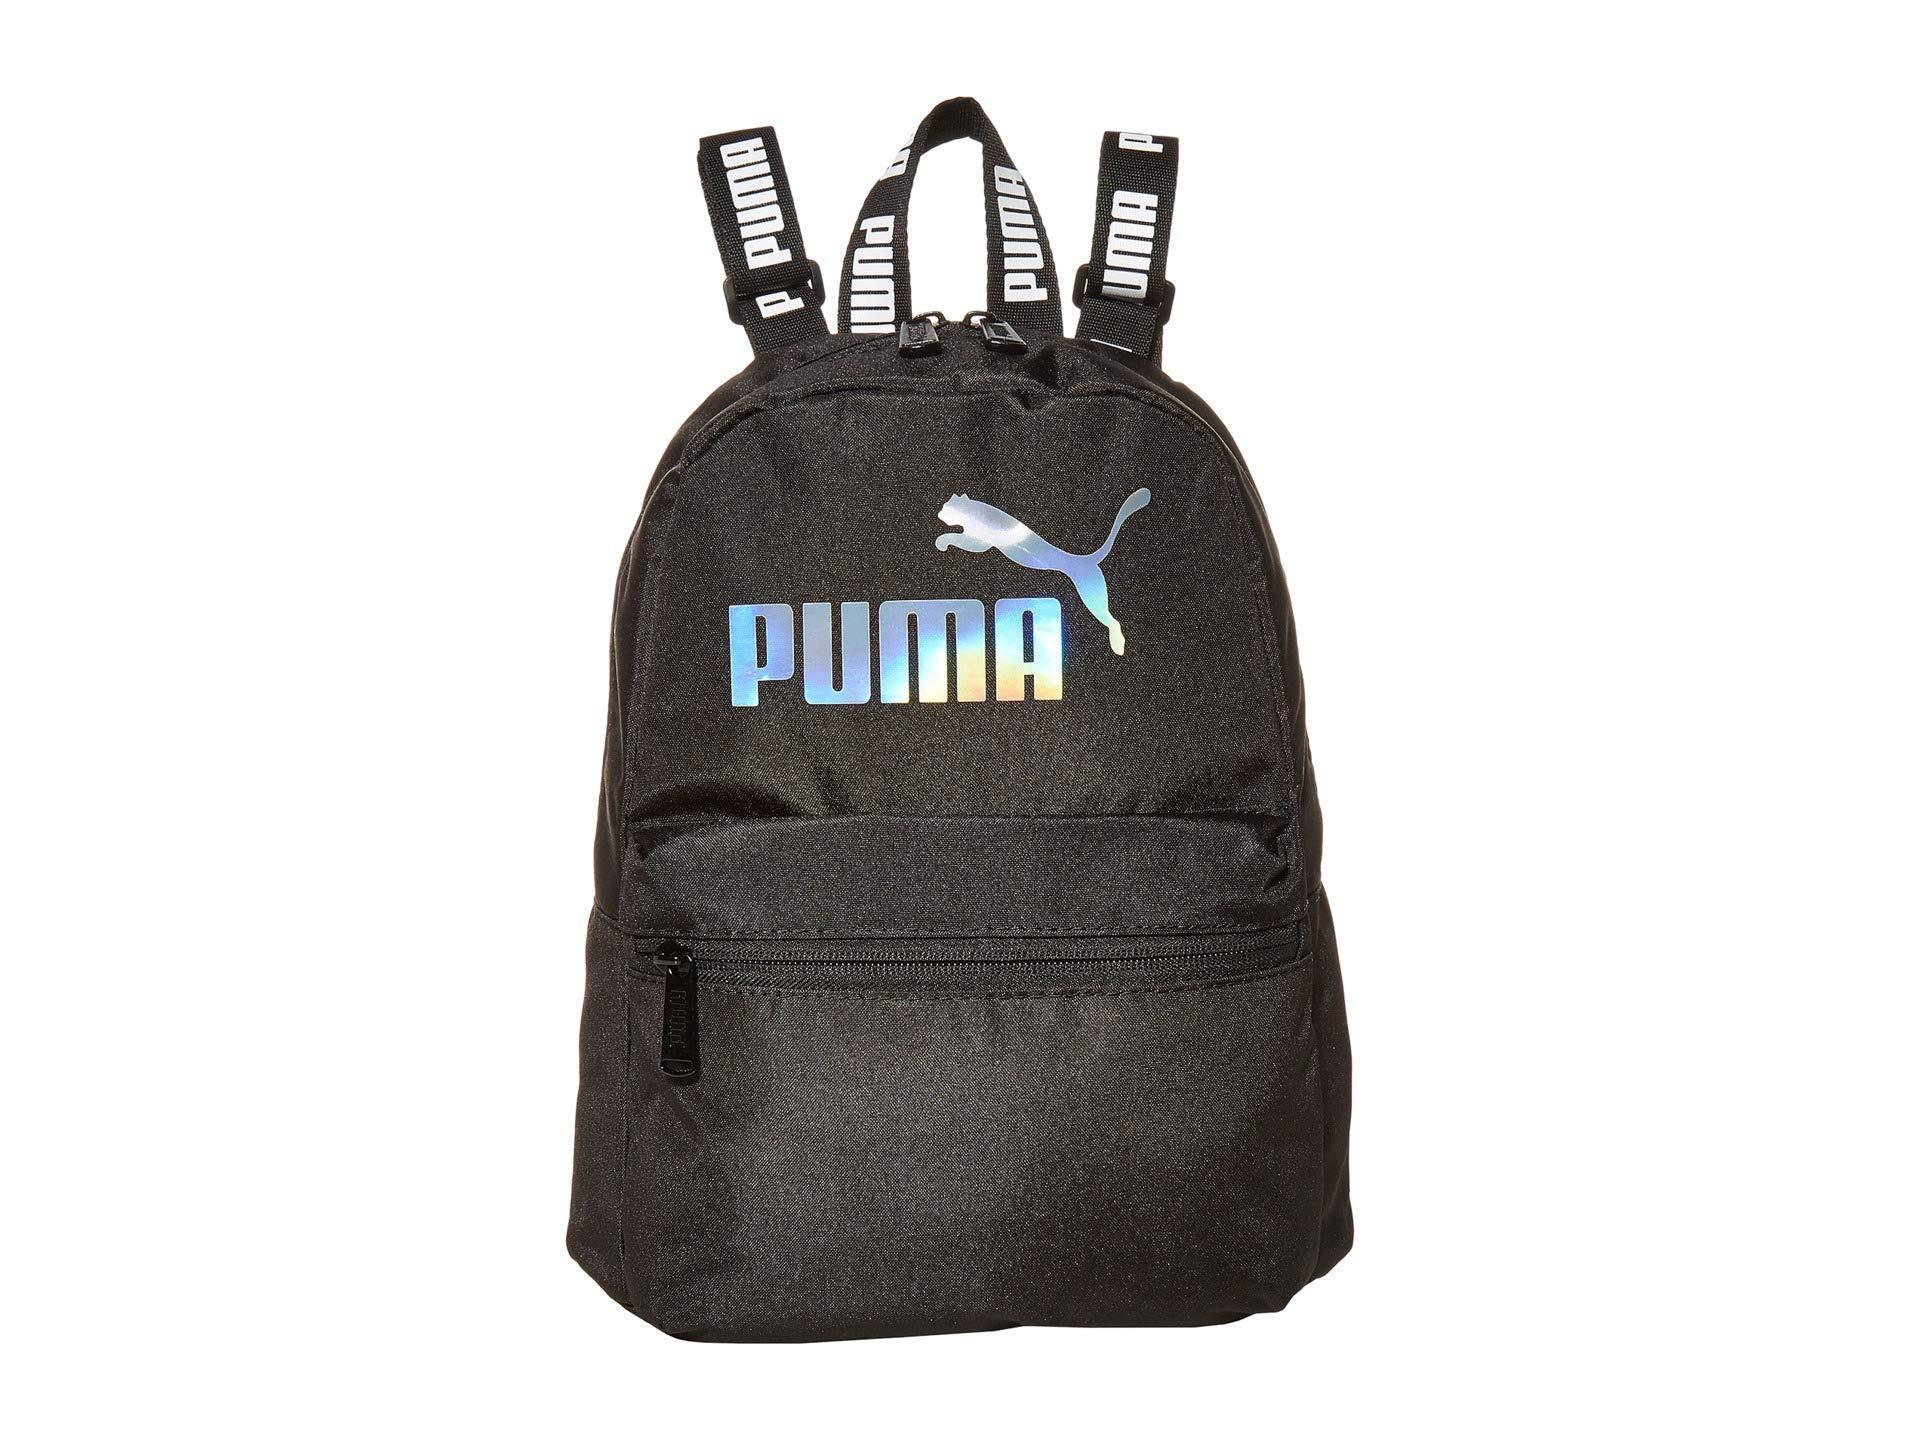 PUMA Mini Backpack in Black - Lyst